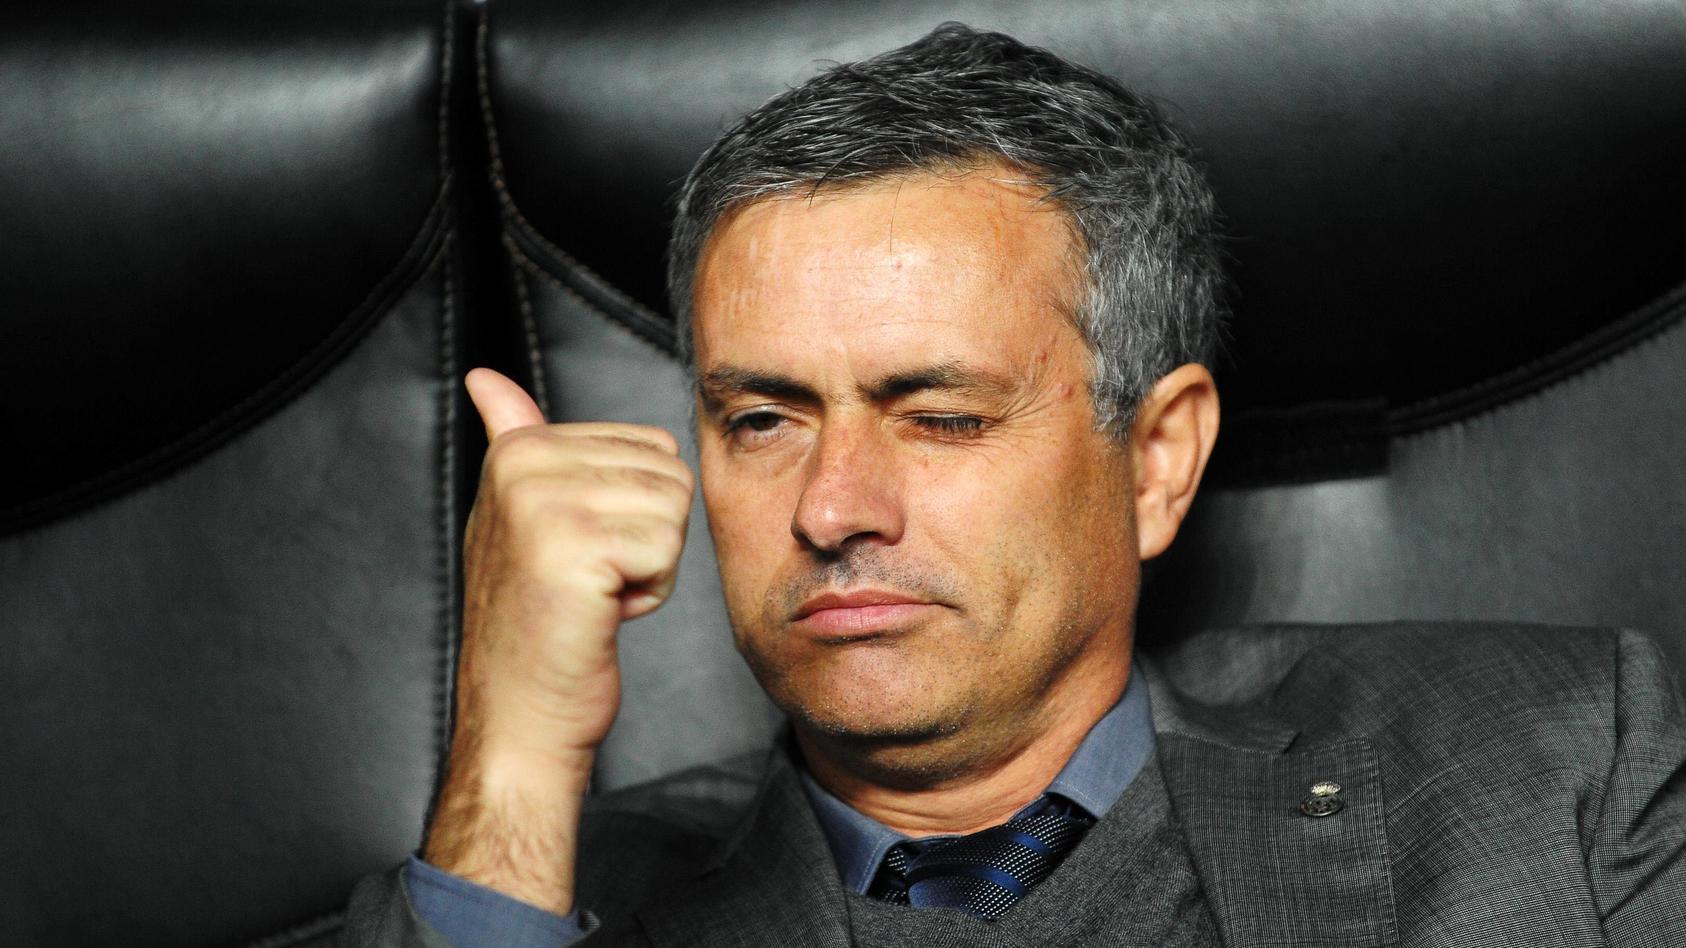 Coach Jose MOURINHO (Real Madrid) --- UEFA Champions League 2010/2011 - AC Milan (red) vs Real Madrid (white) 2:2 --- P